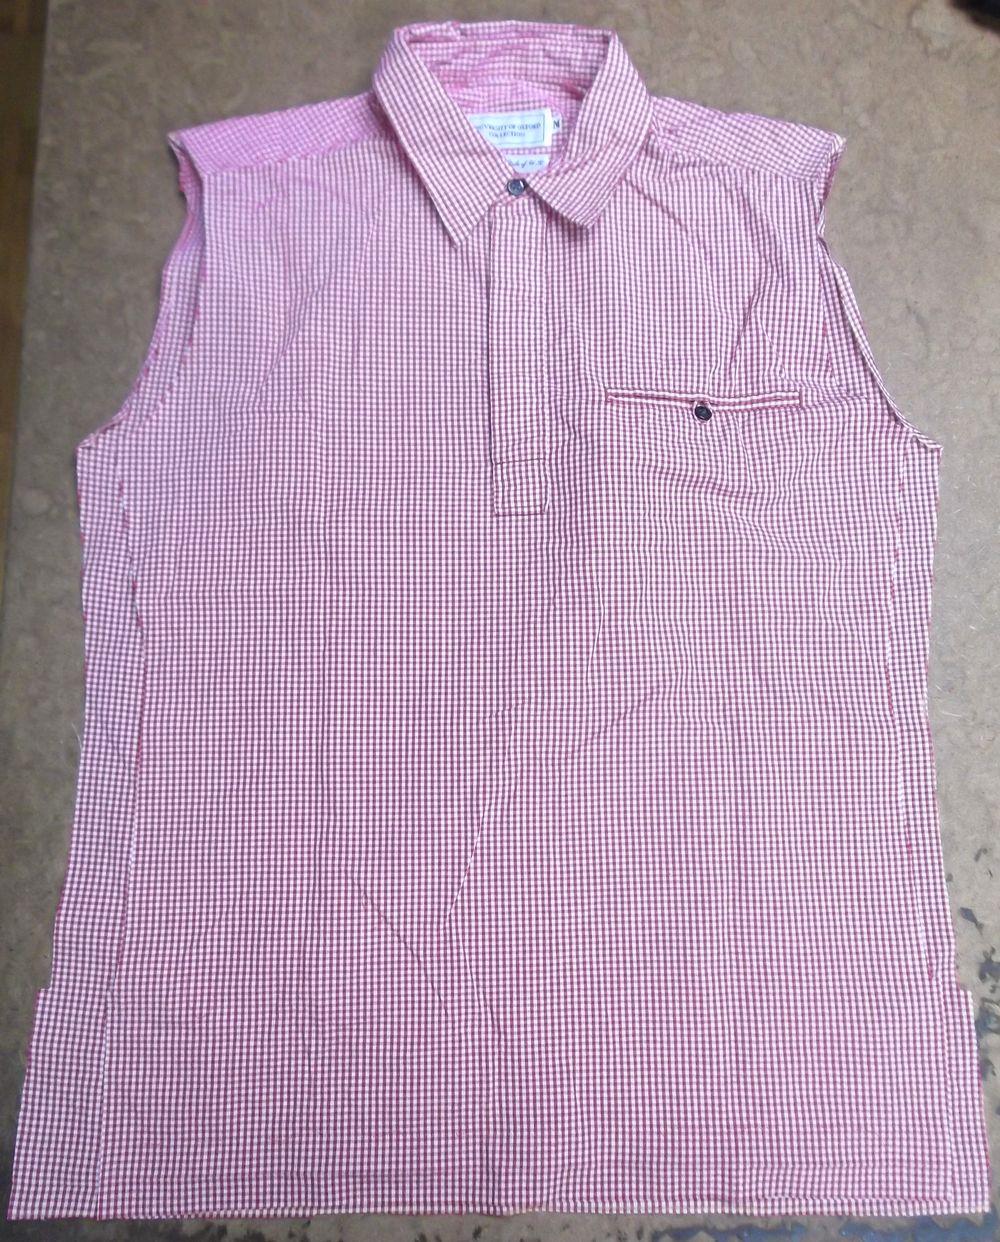 shirt321-4